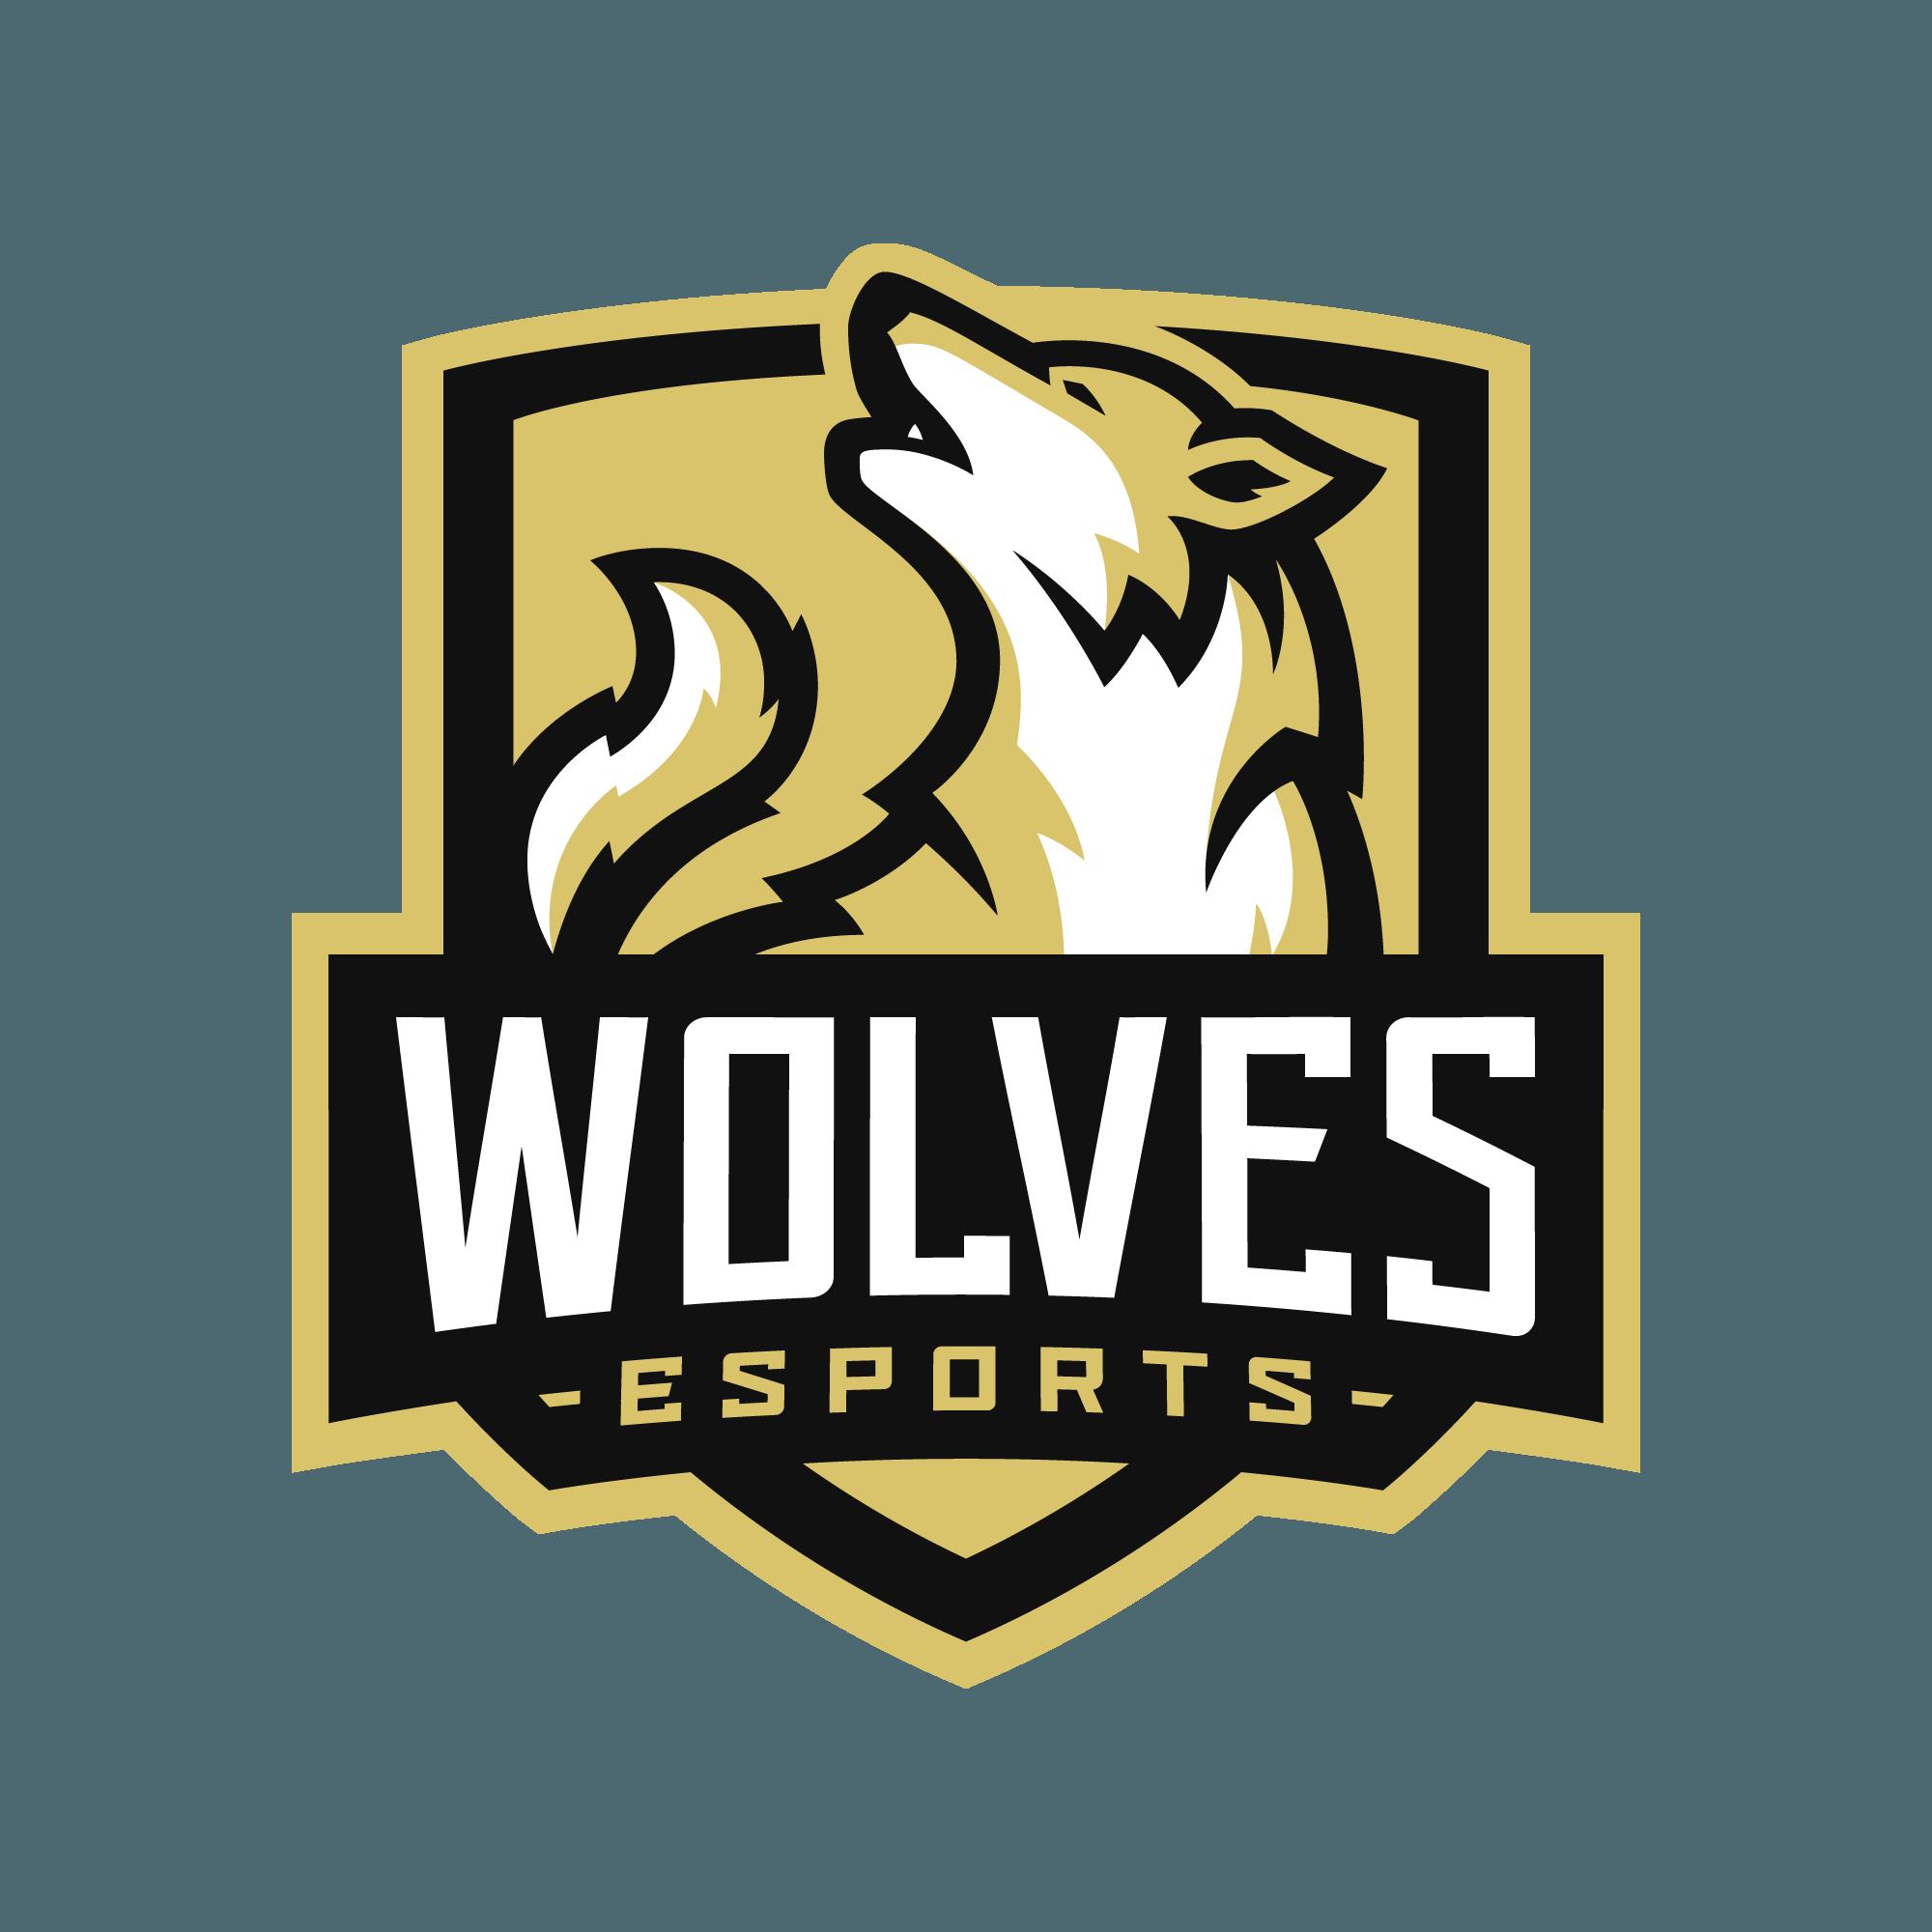 - Wolves eSports -